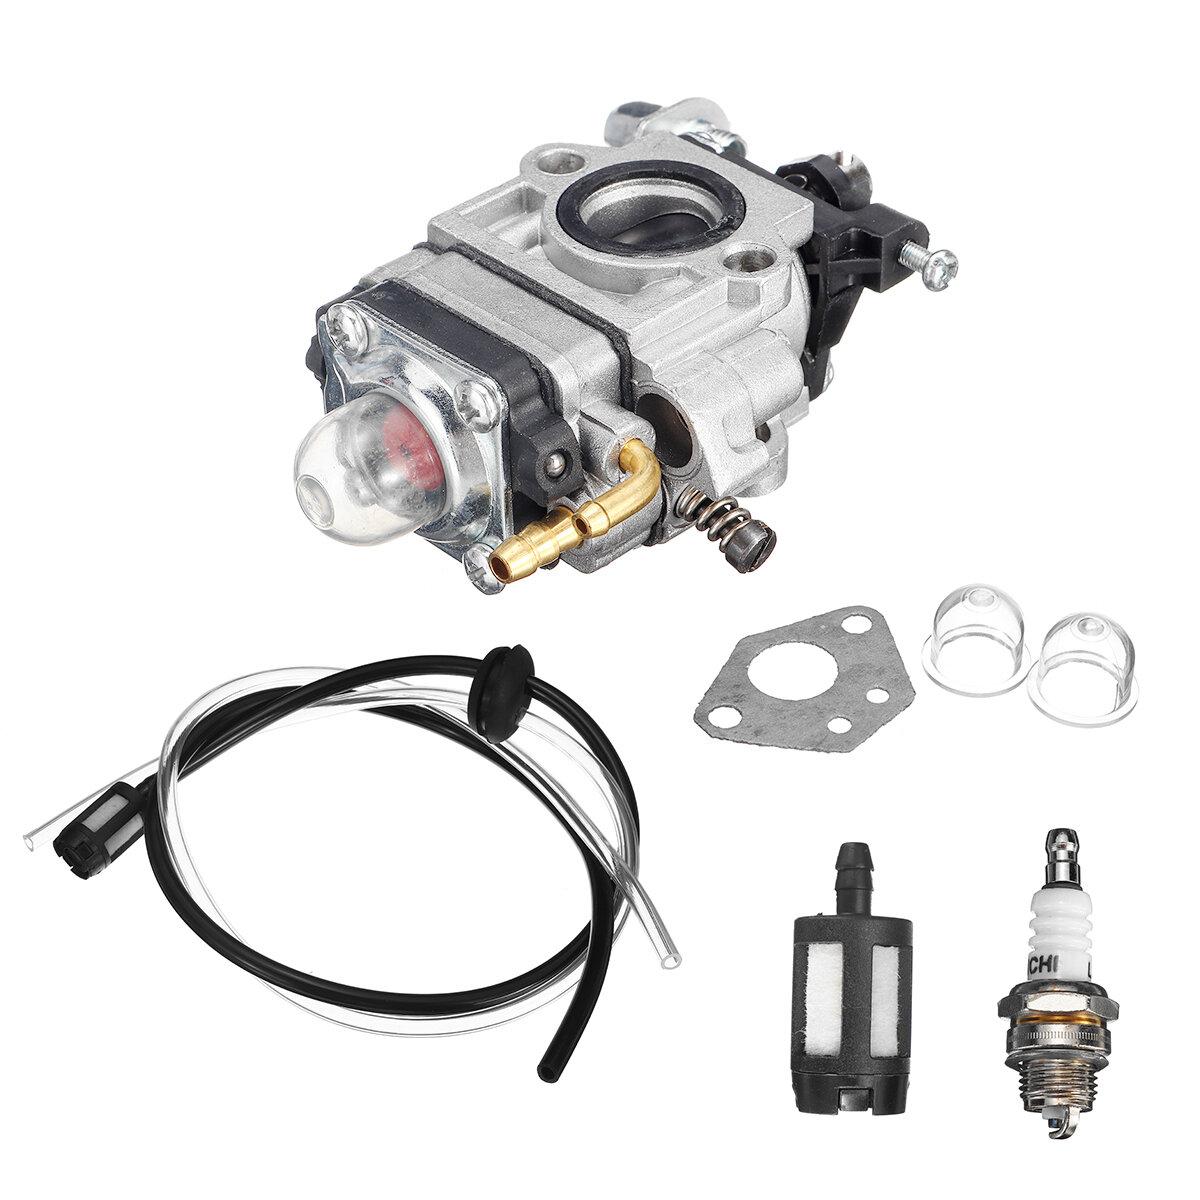 hight resolution of 43cc 47cc 49cc carb carburetor for 2 stroke engine scooter dirt pocket bike cod